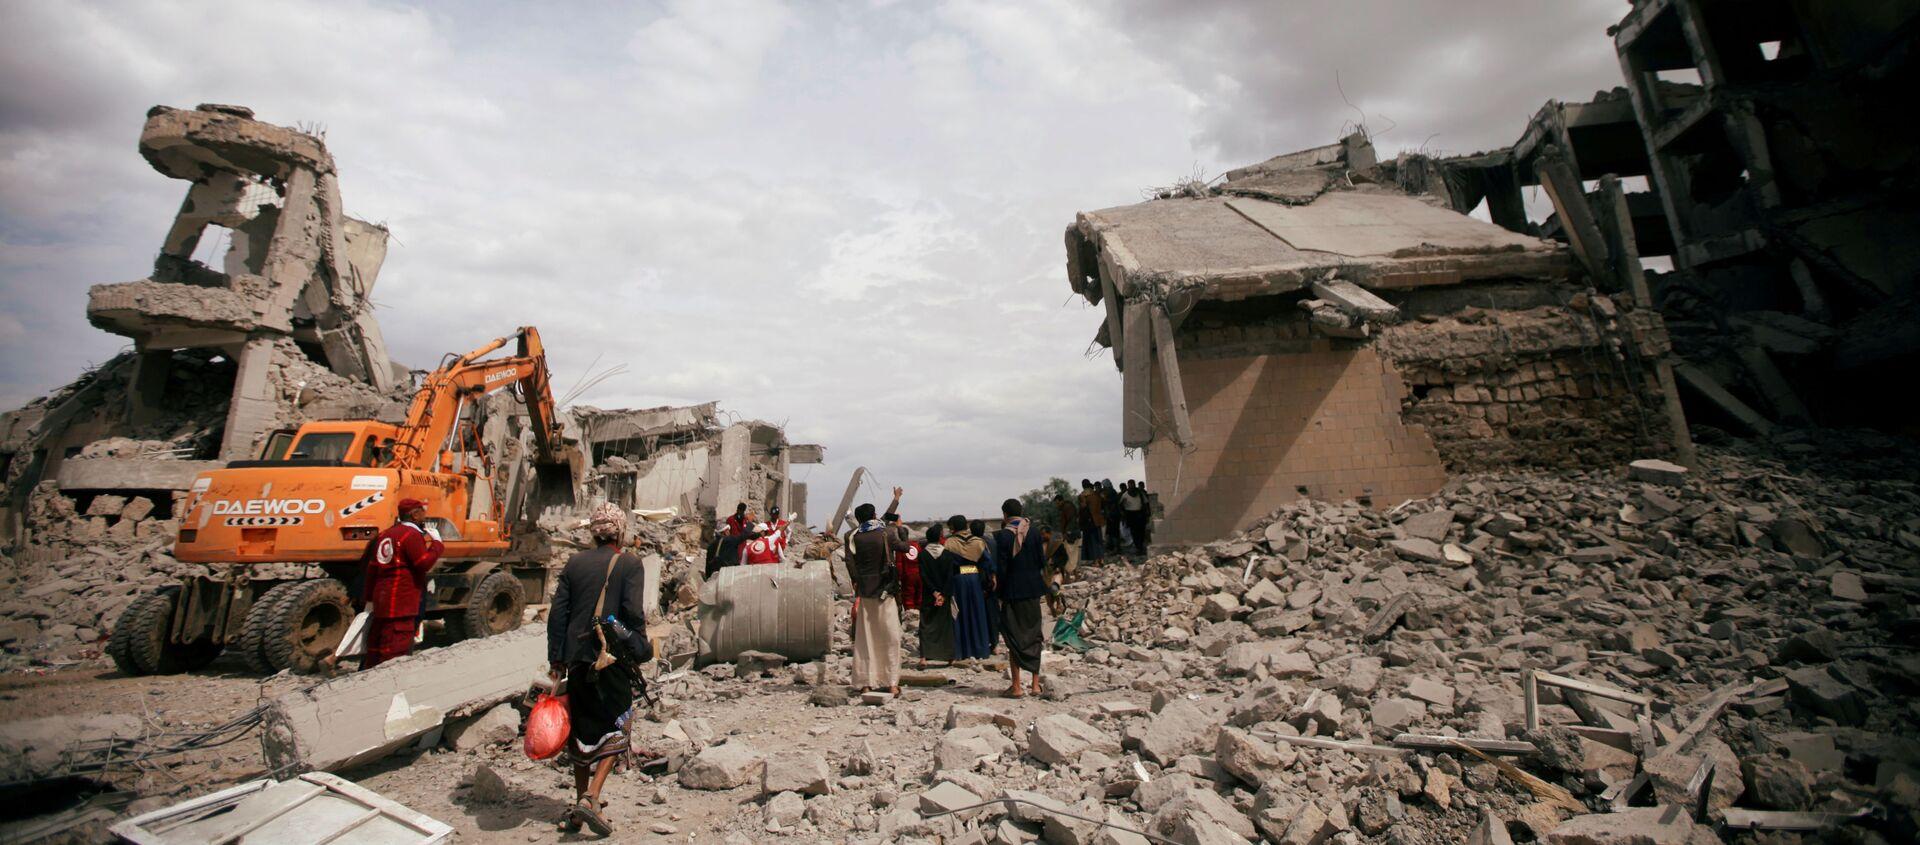 Situación en Yemen - Sputnik Mundo, 1920, 04.09.2019